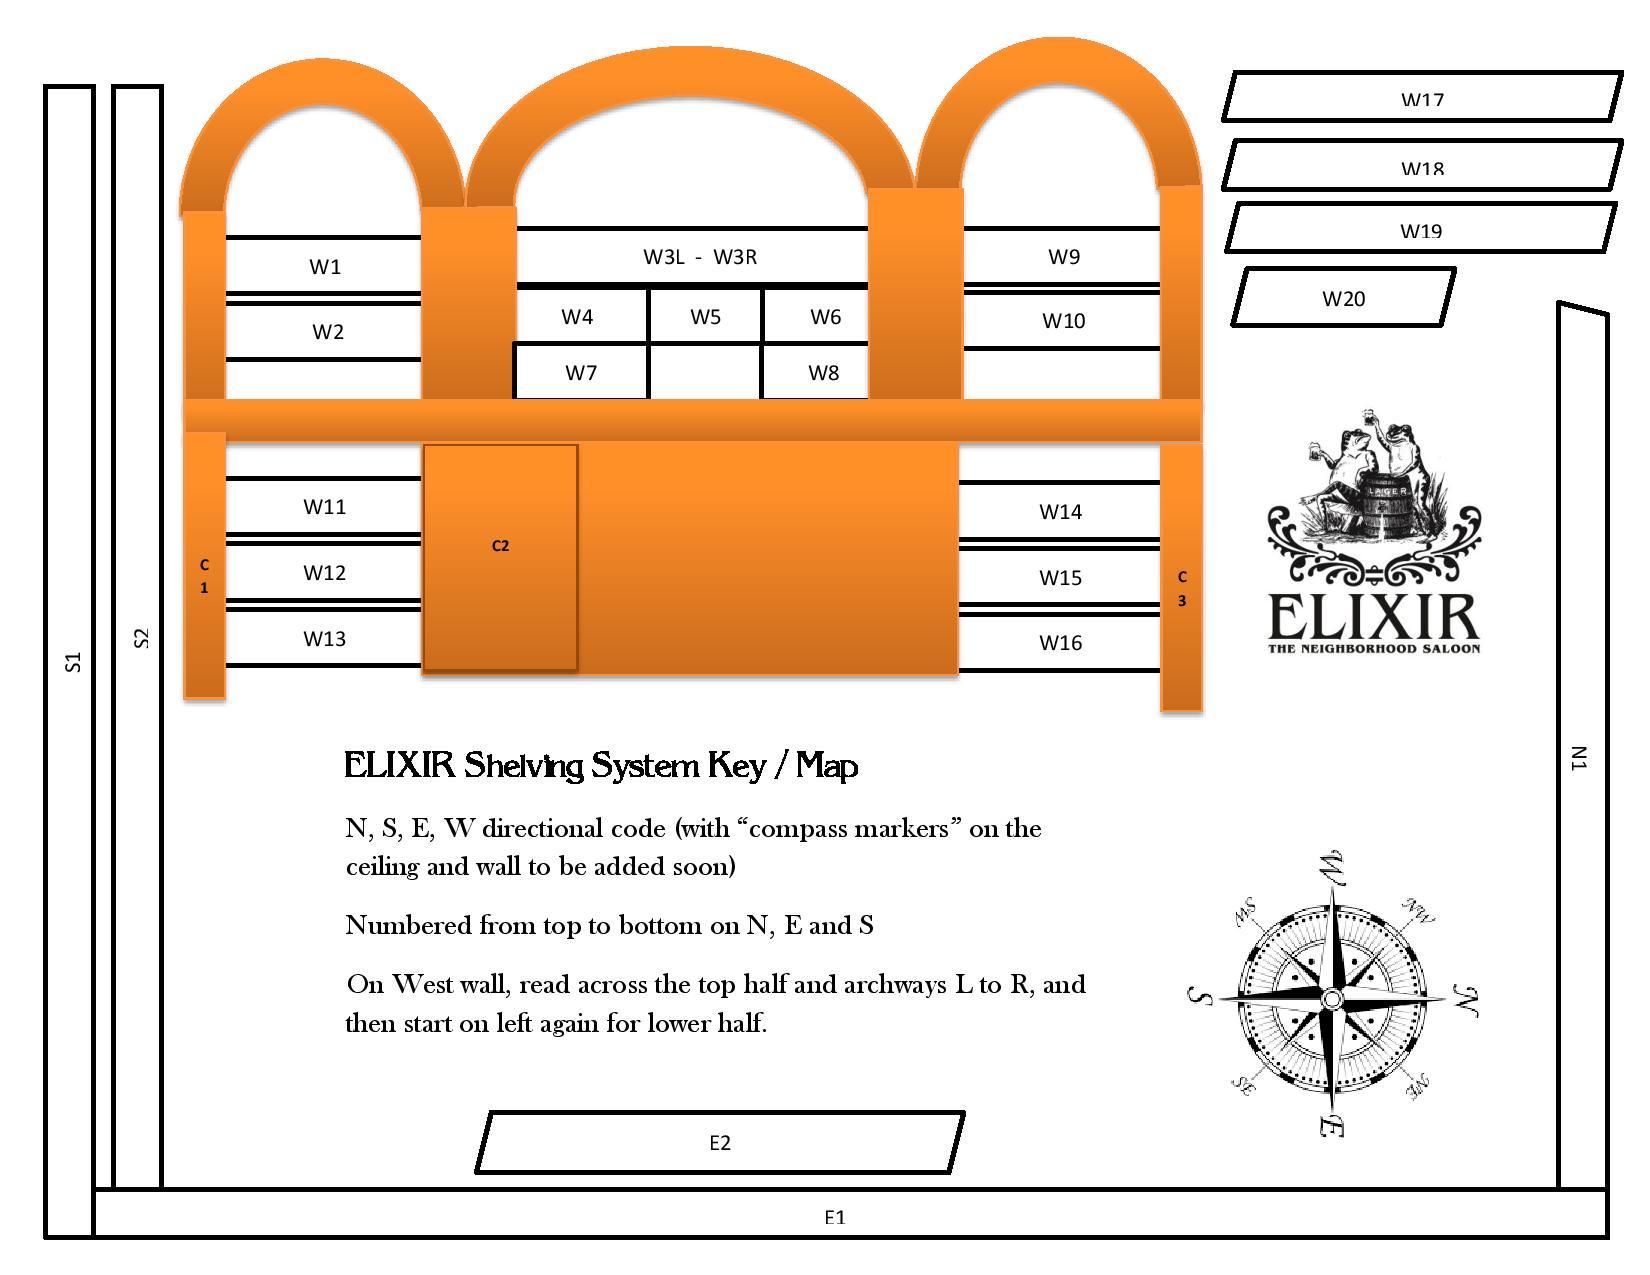 20180321 Elixir Shelving System Key 20180321 Compass Model Menu version-page-001